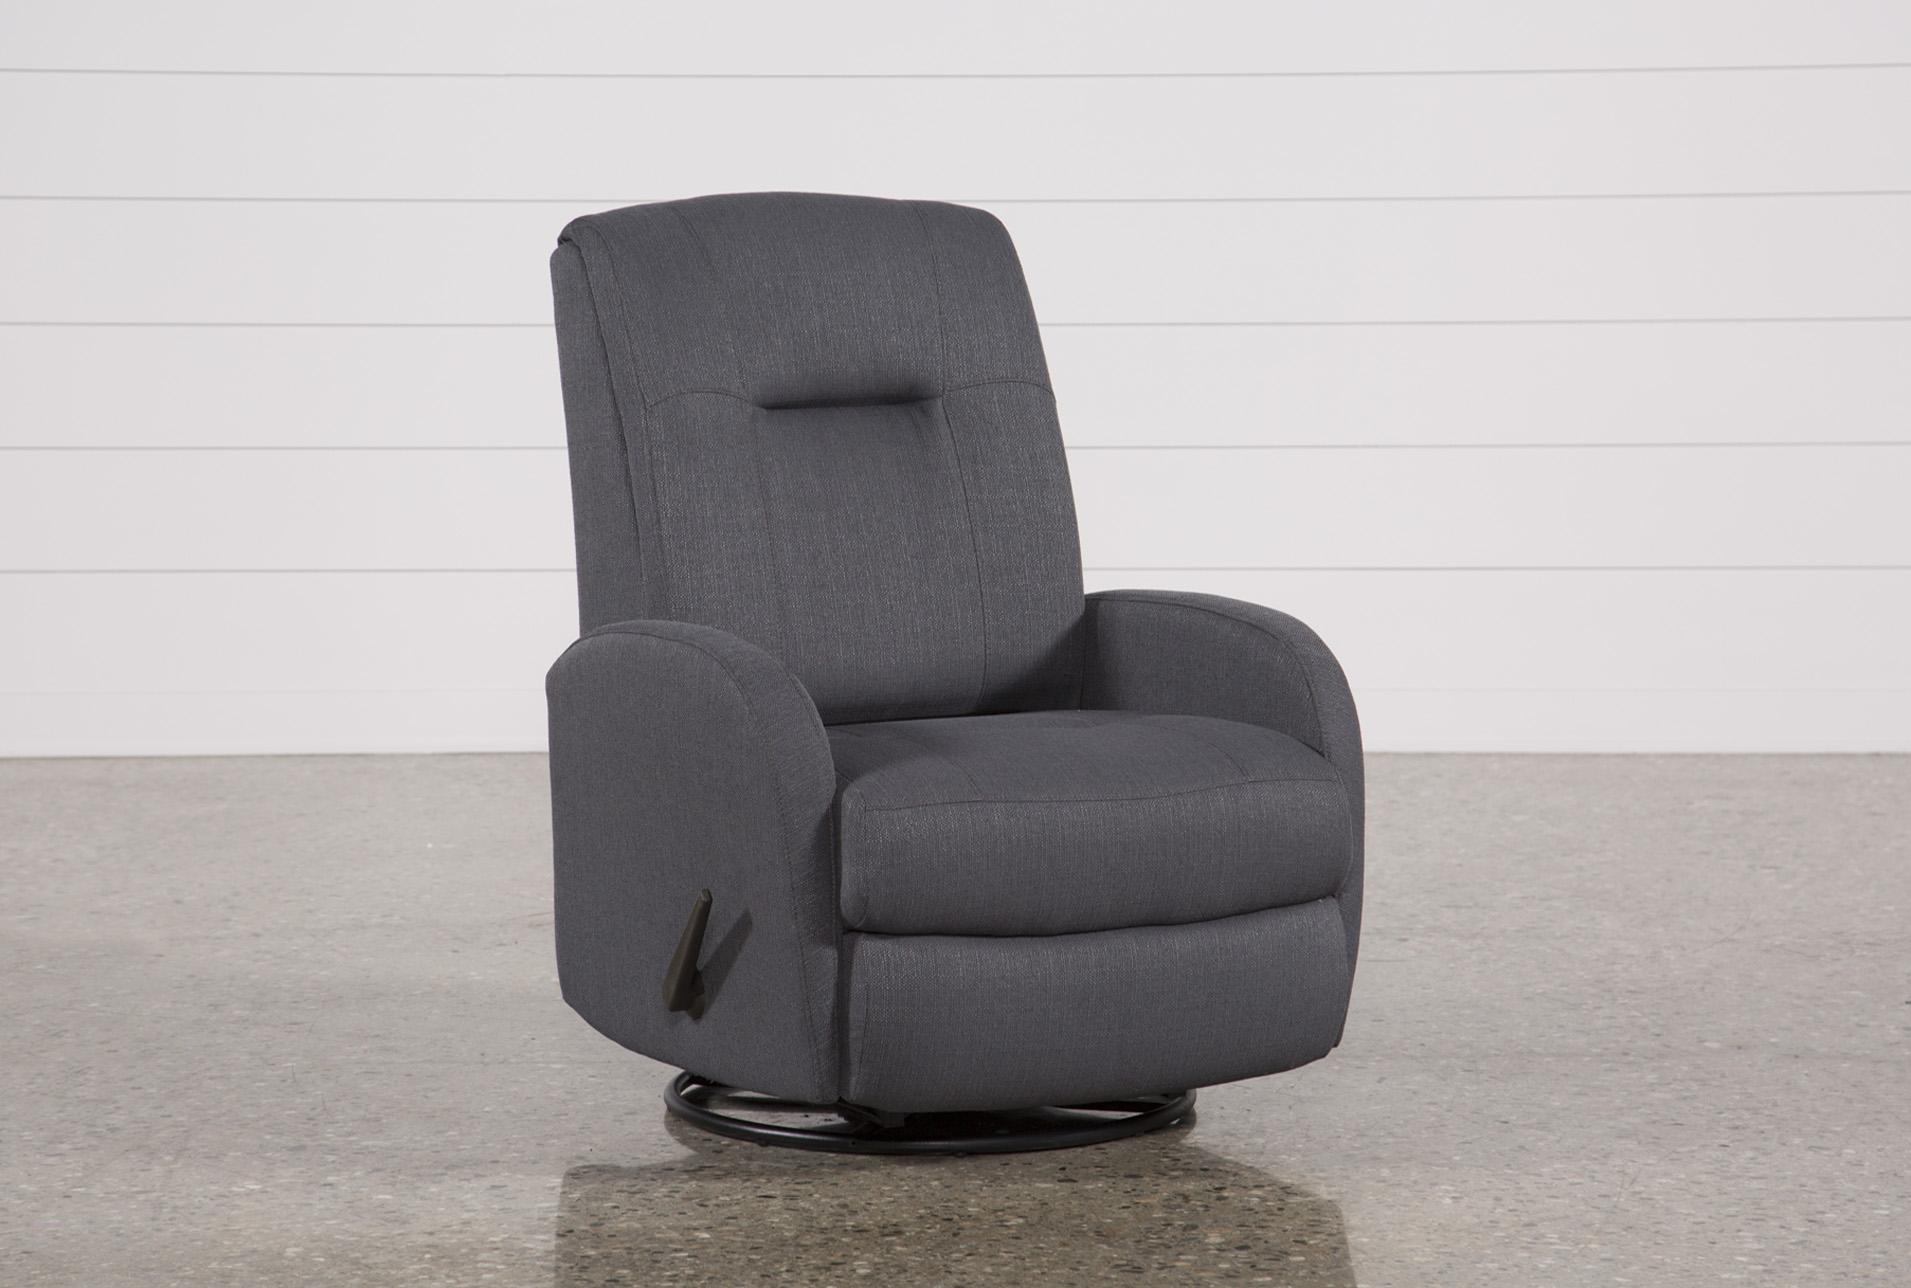 franco iii fabric swivel rocker recliner - 360 ITWYIEP